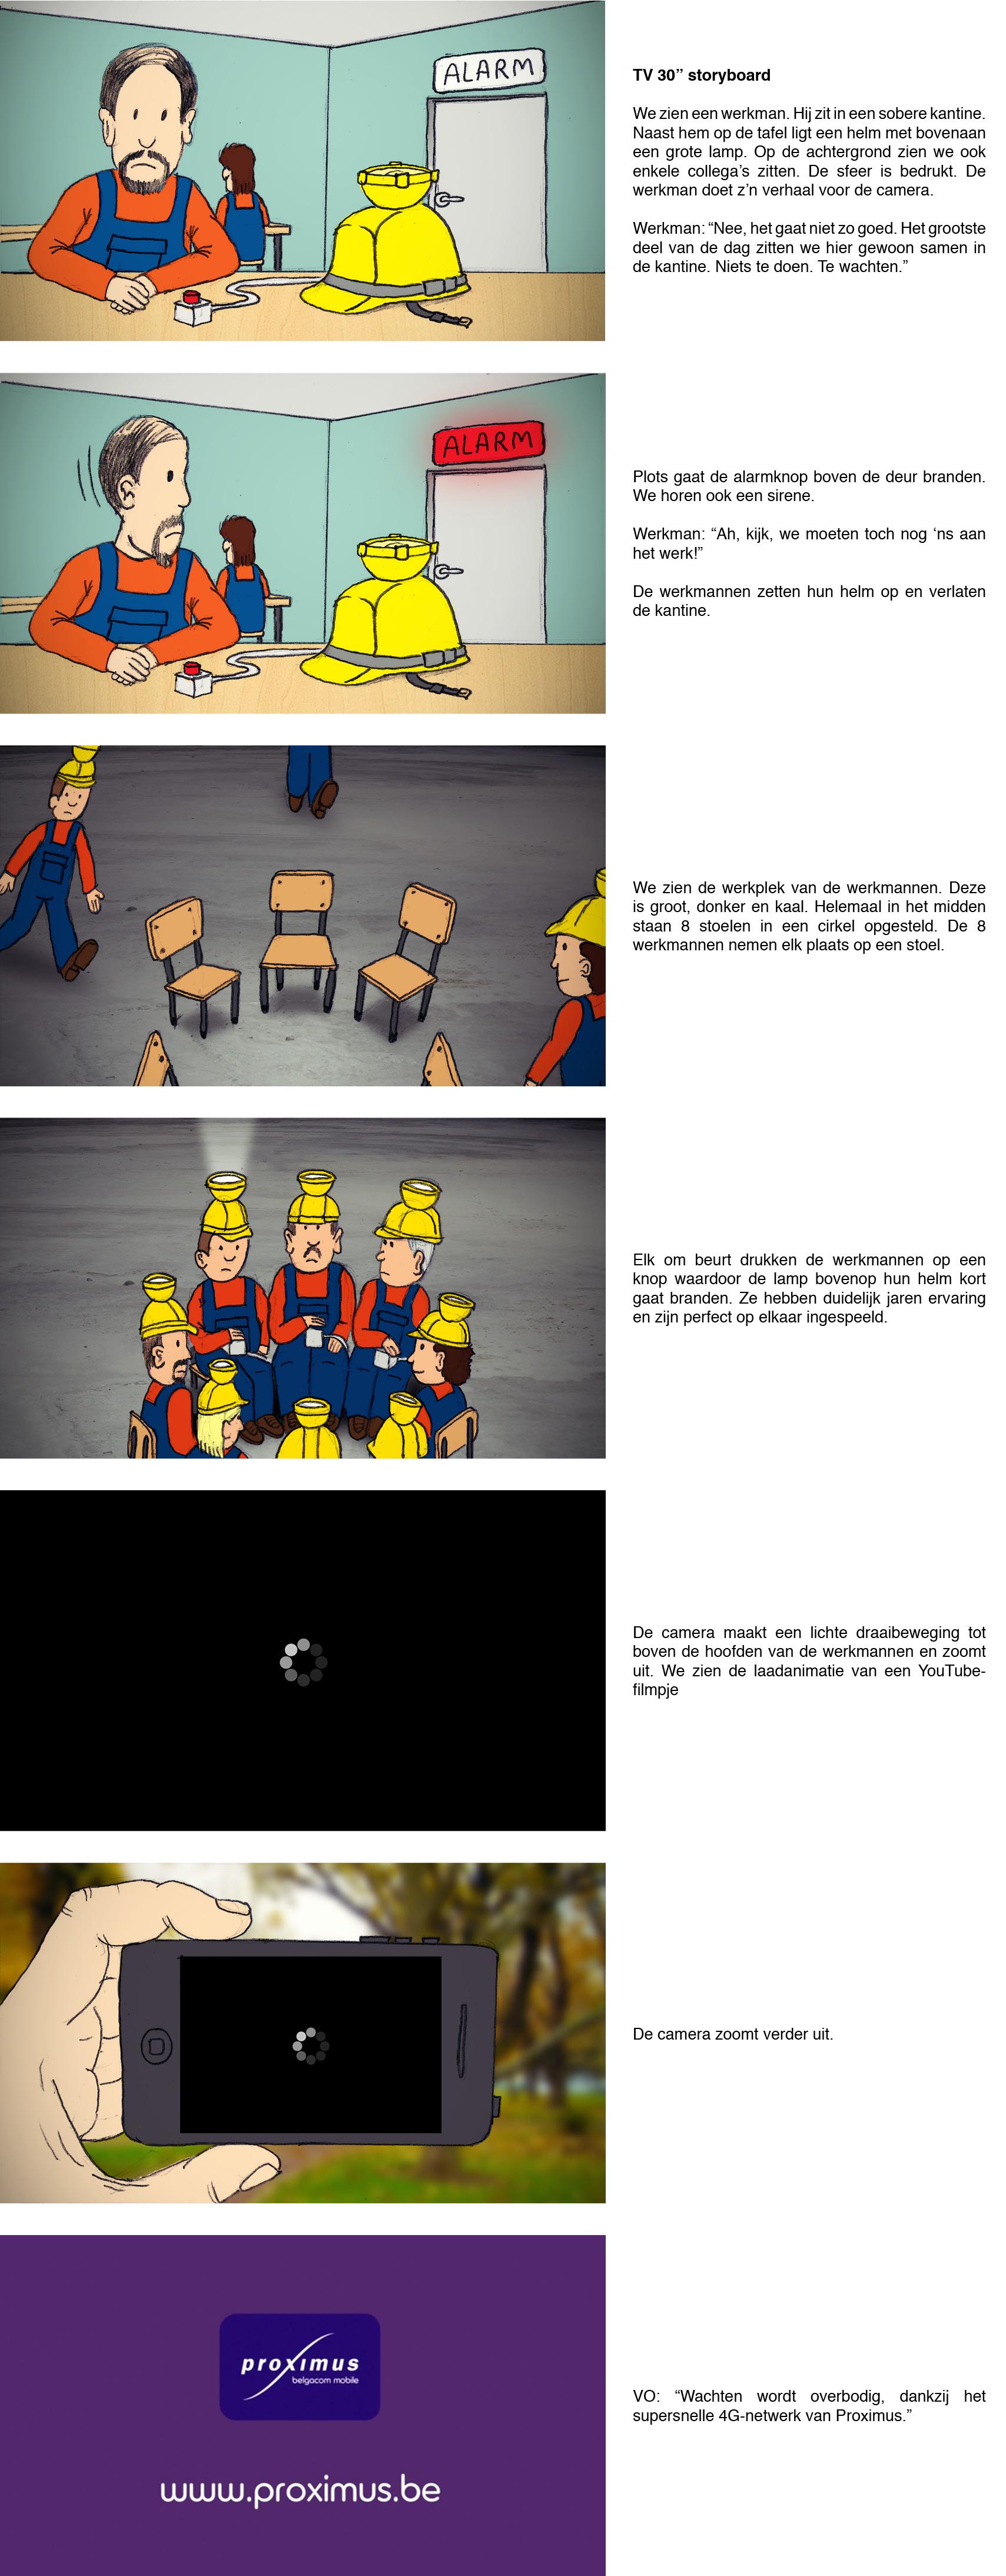 Proximus4G_Storyboard